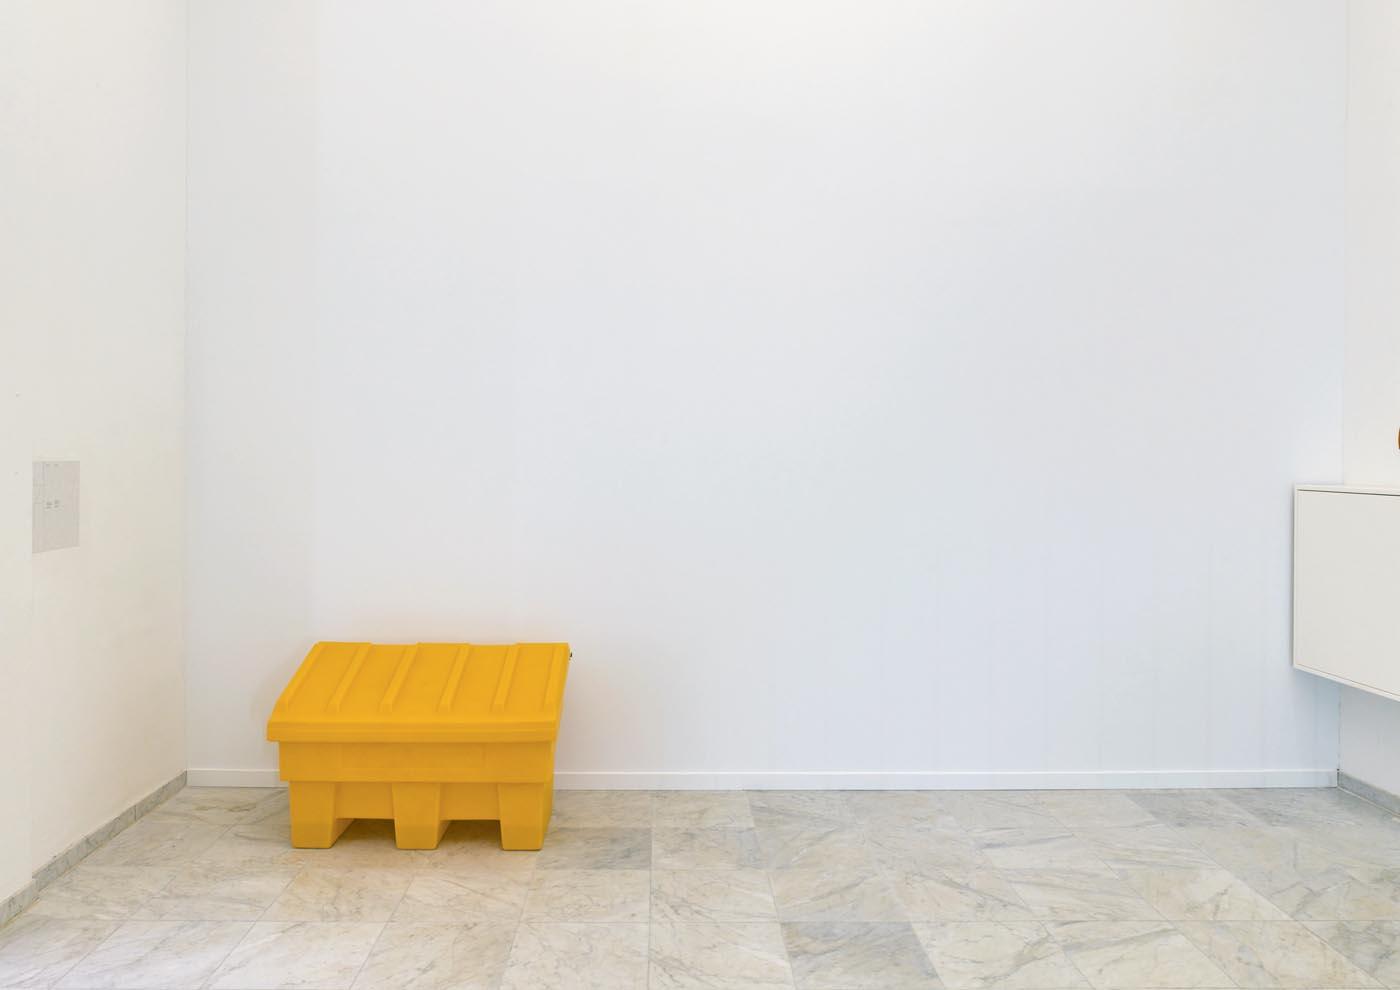 <p><em>Untitled</em>, 2015, 963×512×493cm, wood, plasterboard, wall paint<br /><em>A Surface</em>, 2015, salt box, water</p>